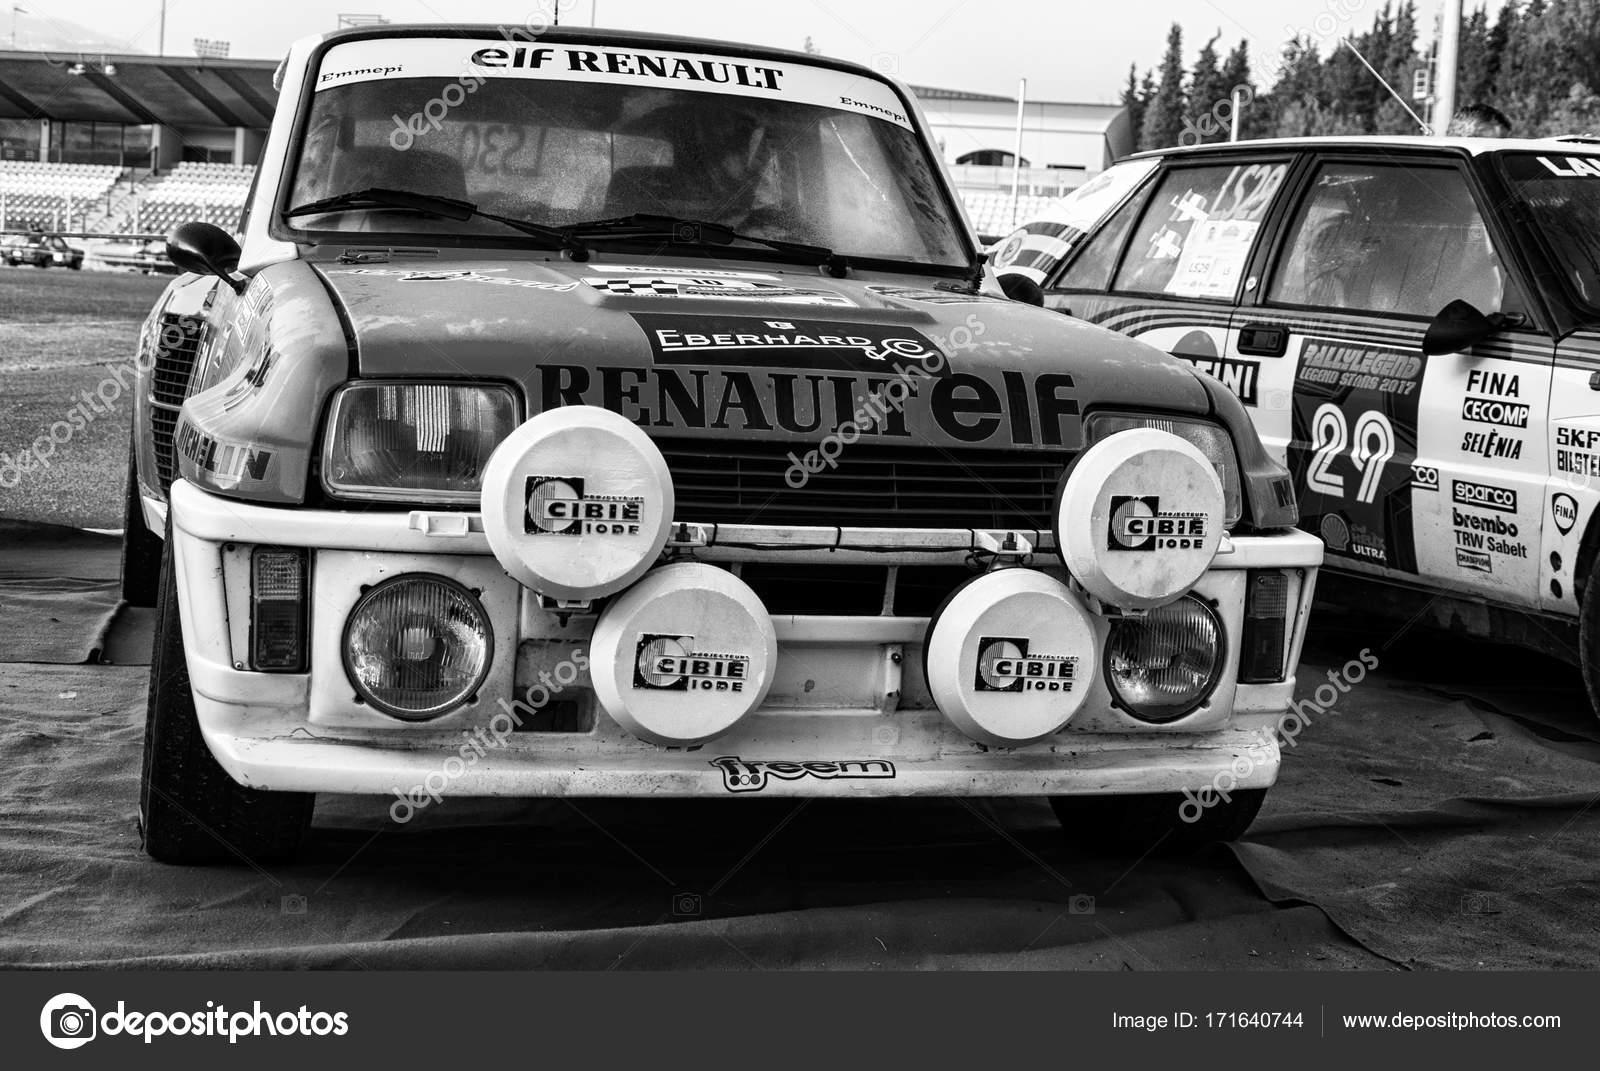 Renault 5 Gt Turbo 1982 Old Racing Car Rally Stock Editorial Photo C Massimocampa 171640744